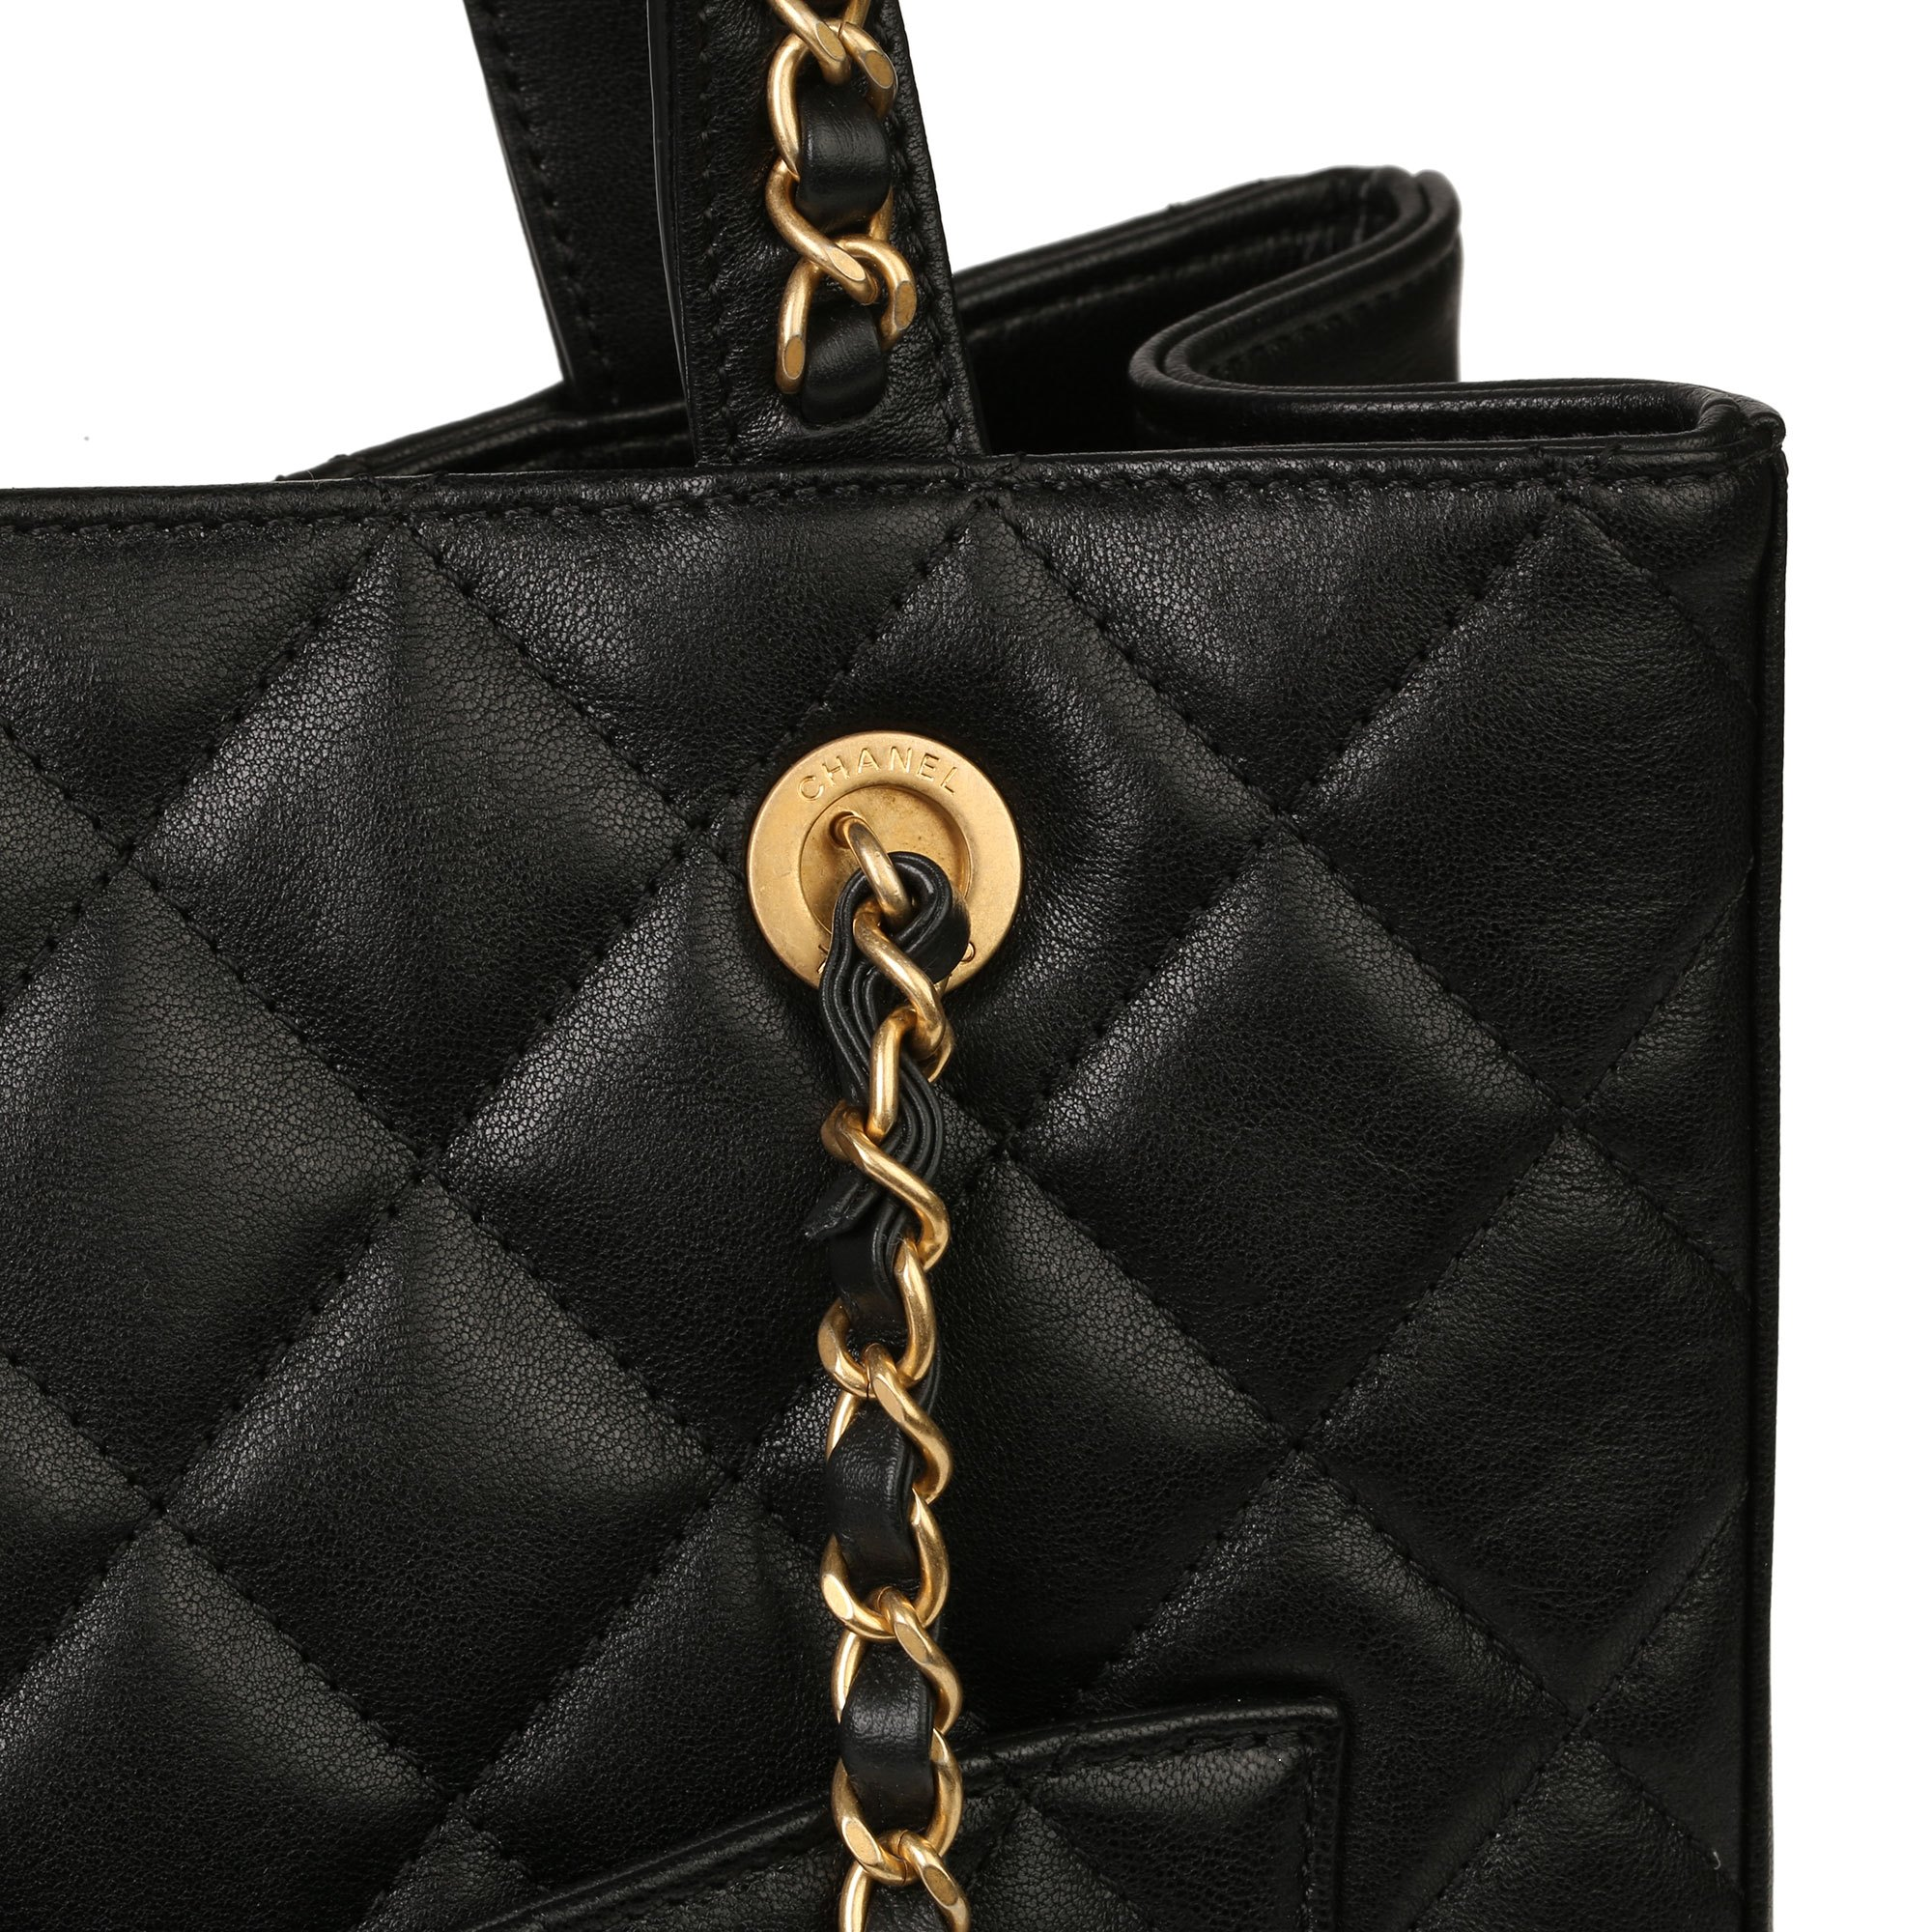 Chanel Black Quilted Calfskin Leather 19 Shoulder Tote